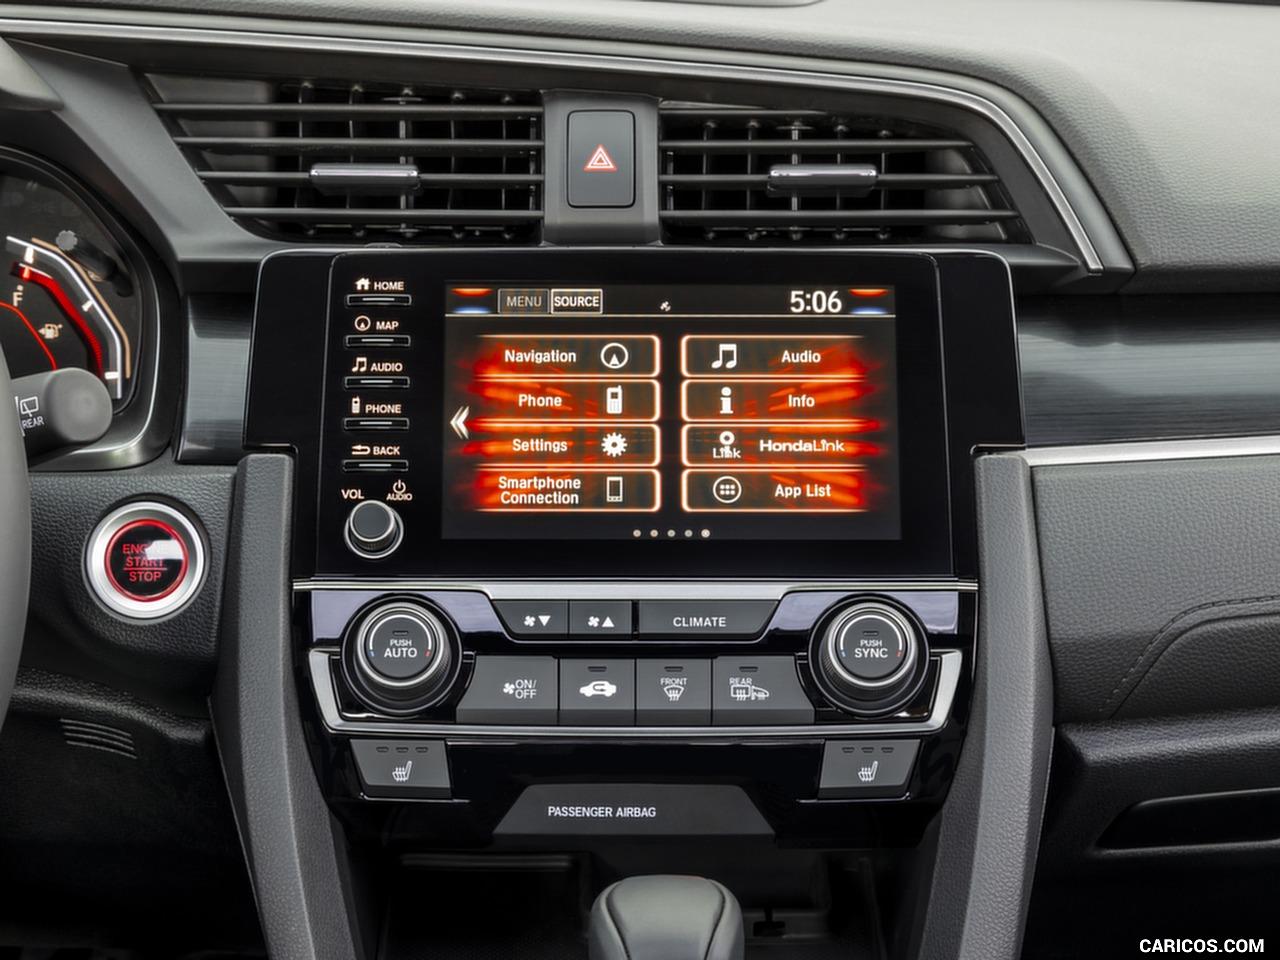 2020 Honda Civic Hatchback   Central Console HD Wallpaper 9 1280x960